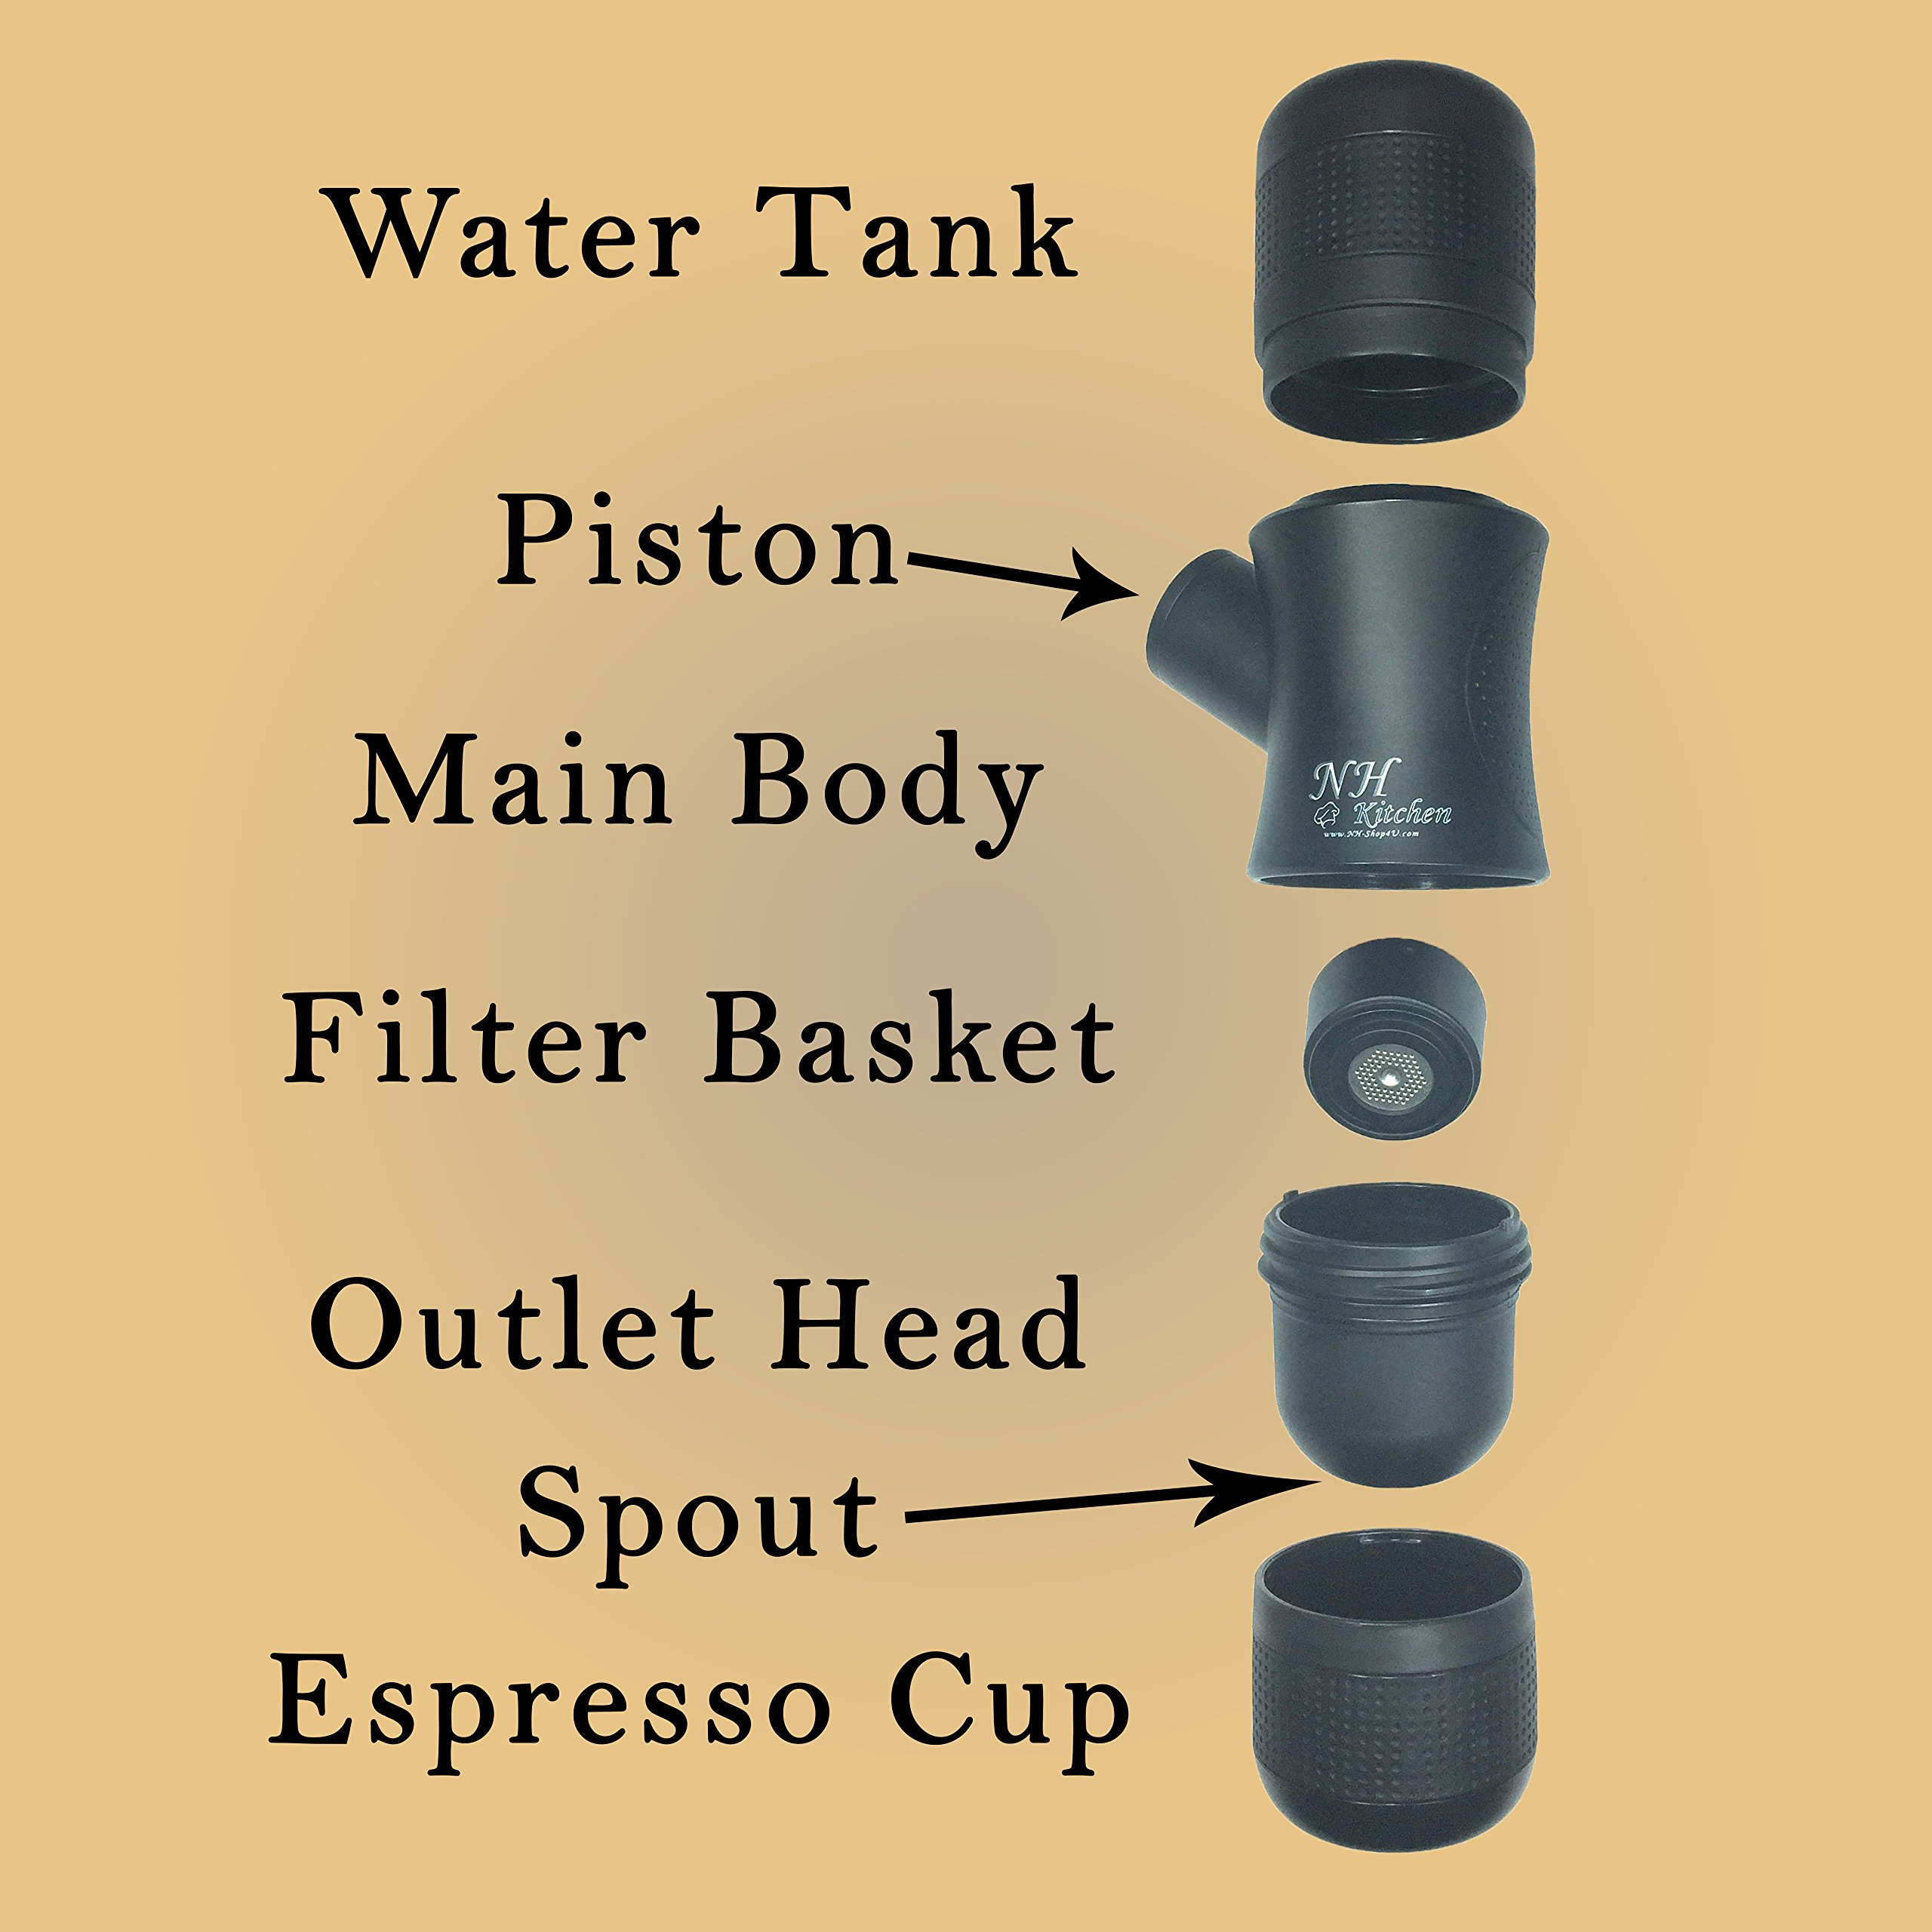 ☕️ Mini Espresso Maker + BONUS! ☕️ Portable Black Compact Manual Coffee Maker, Hand Operated Non-Electric Machine for ESPRESSO ☕️. BONUSES Container for ground coffee ☕️ & Elegant Carry Bag by NH-Kitchen (Image #3)